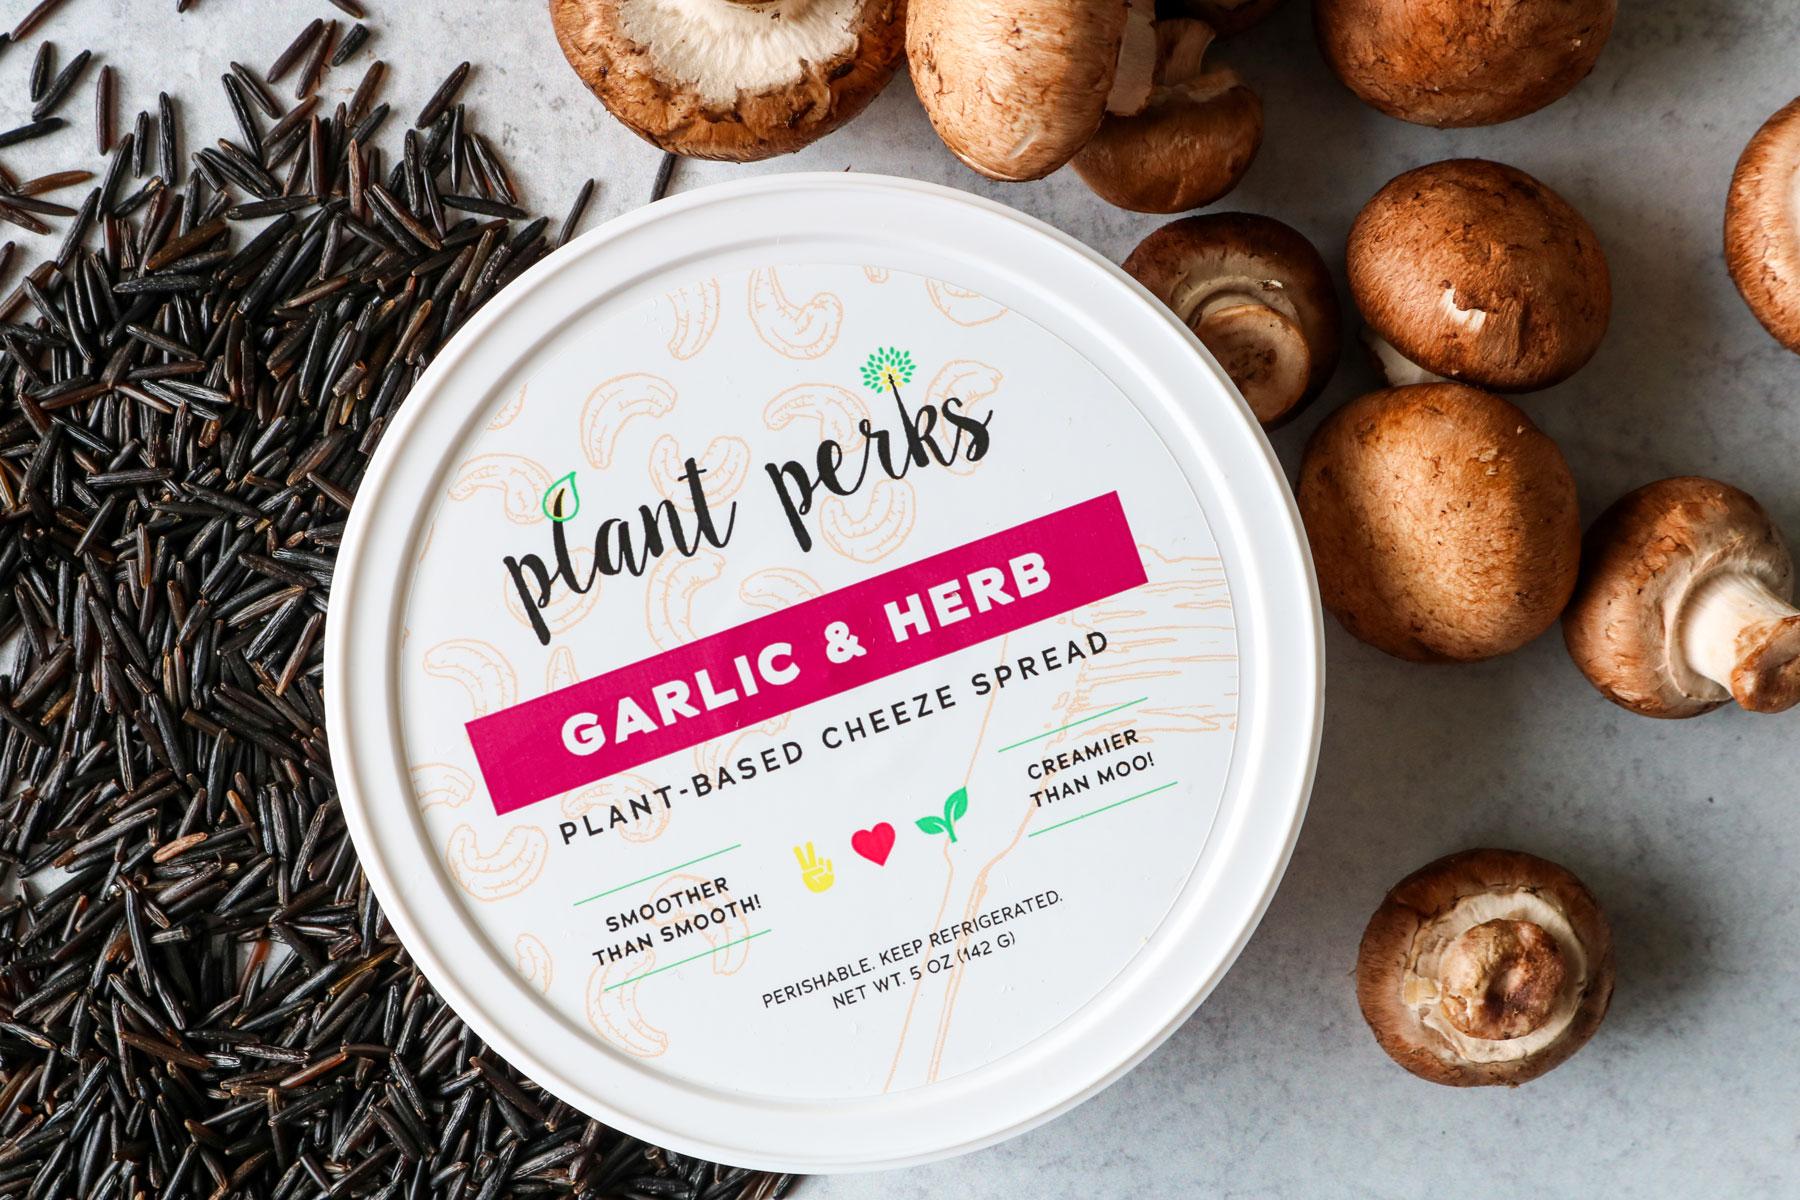 Garlic & Herb Spread Recipes